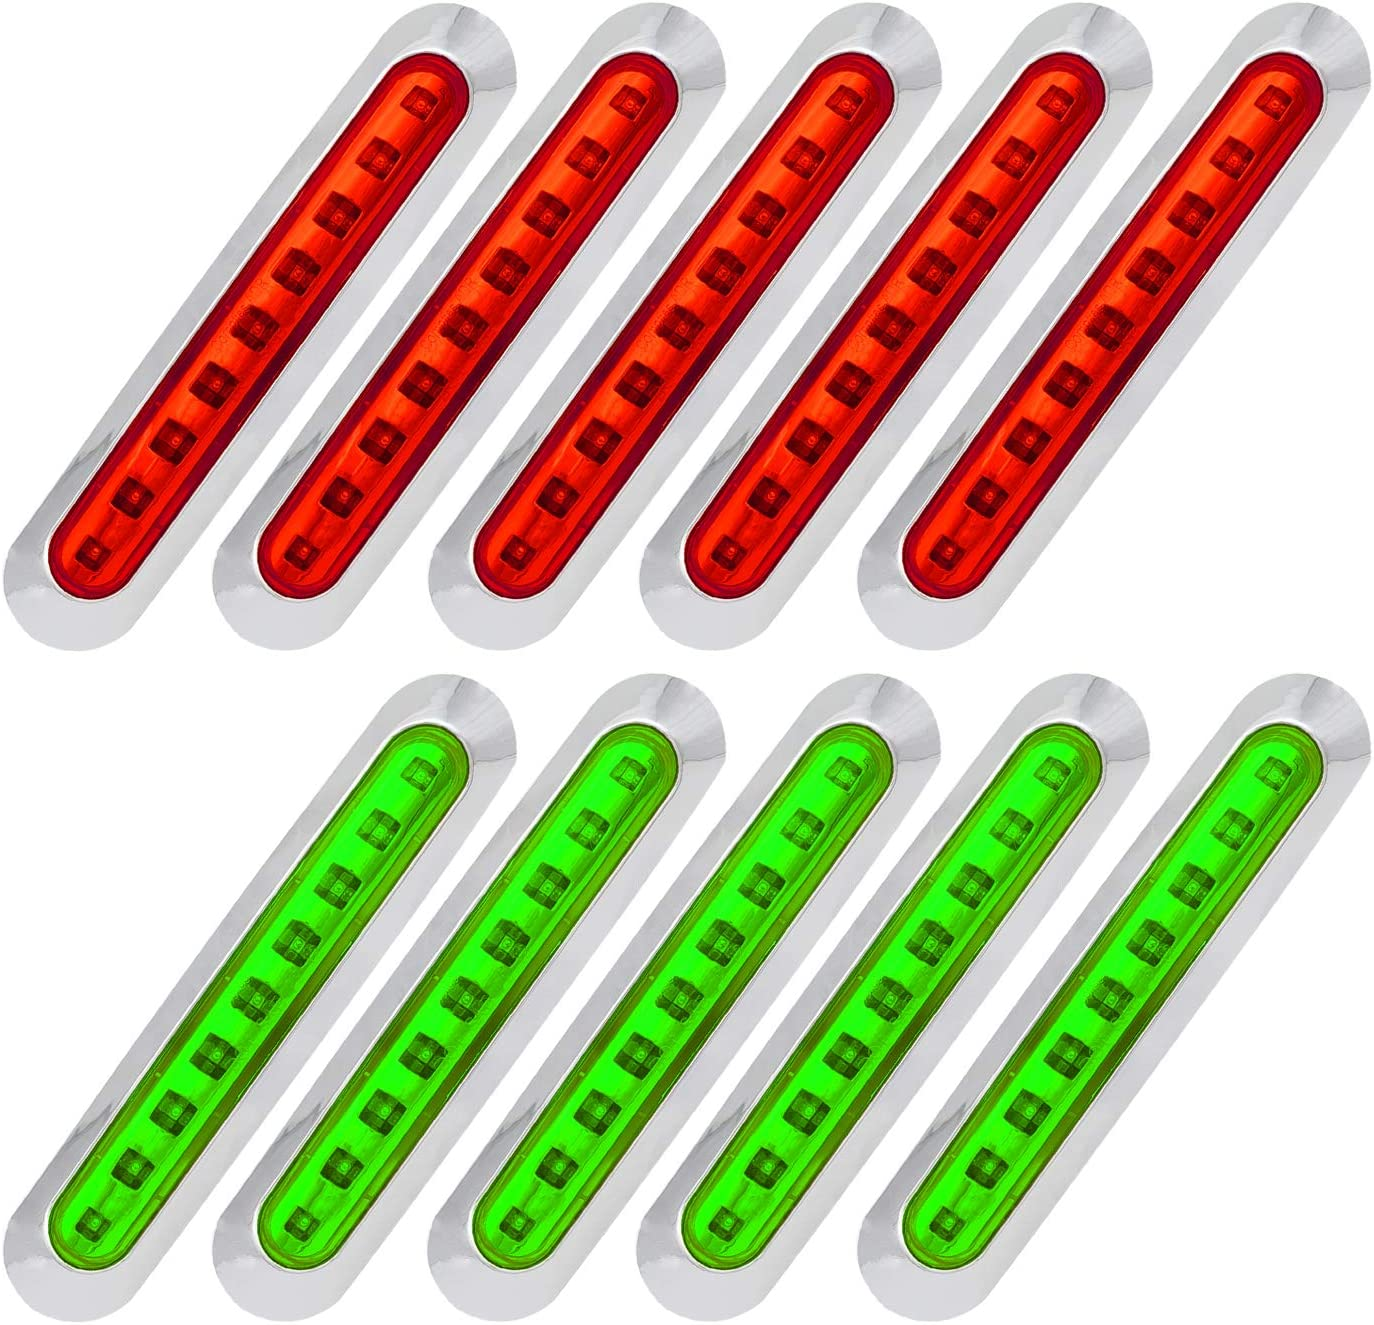 Meerkatt Ranking TOP15 Pack of 10 7 Inch Long Flush Mount SM Red wholesale 5 + Green